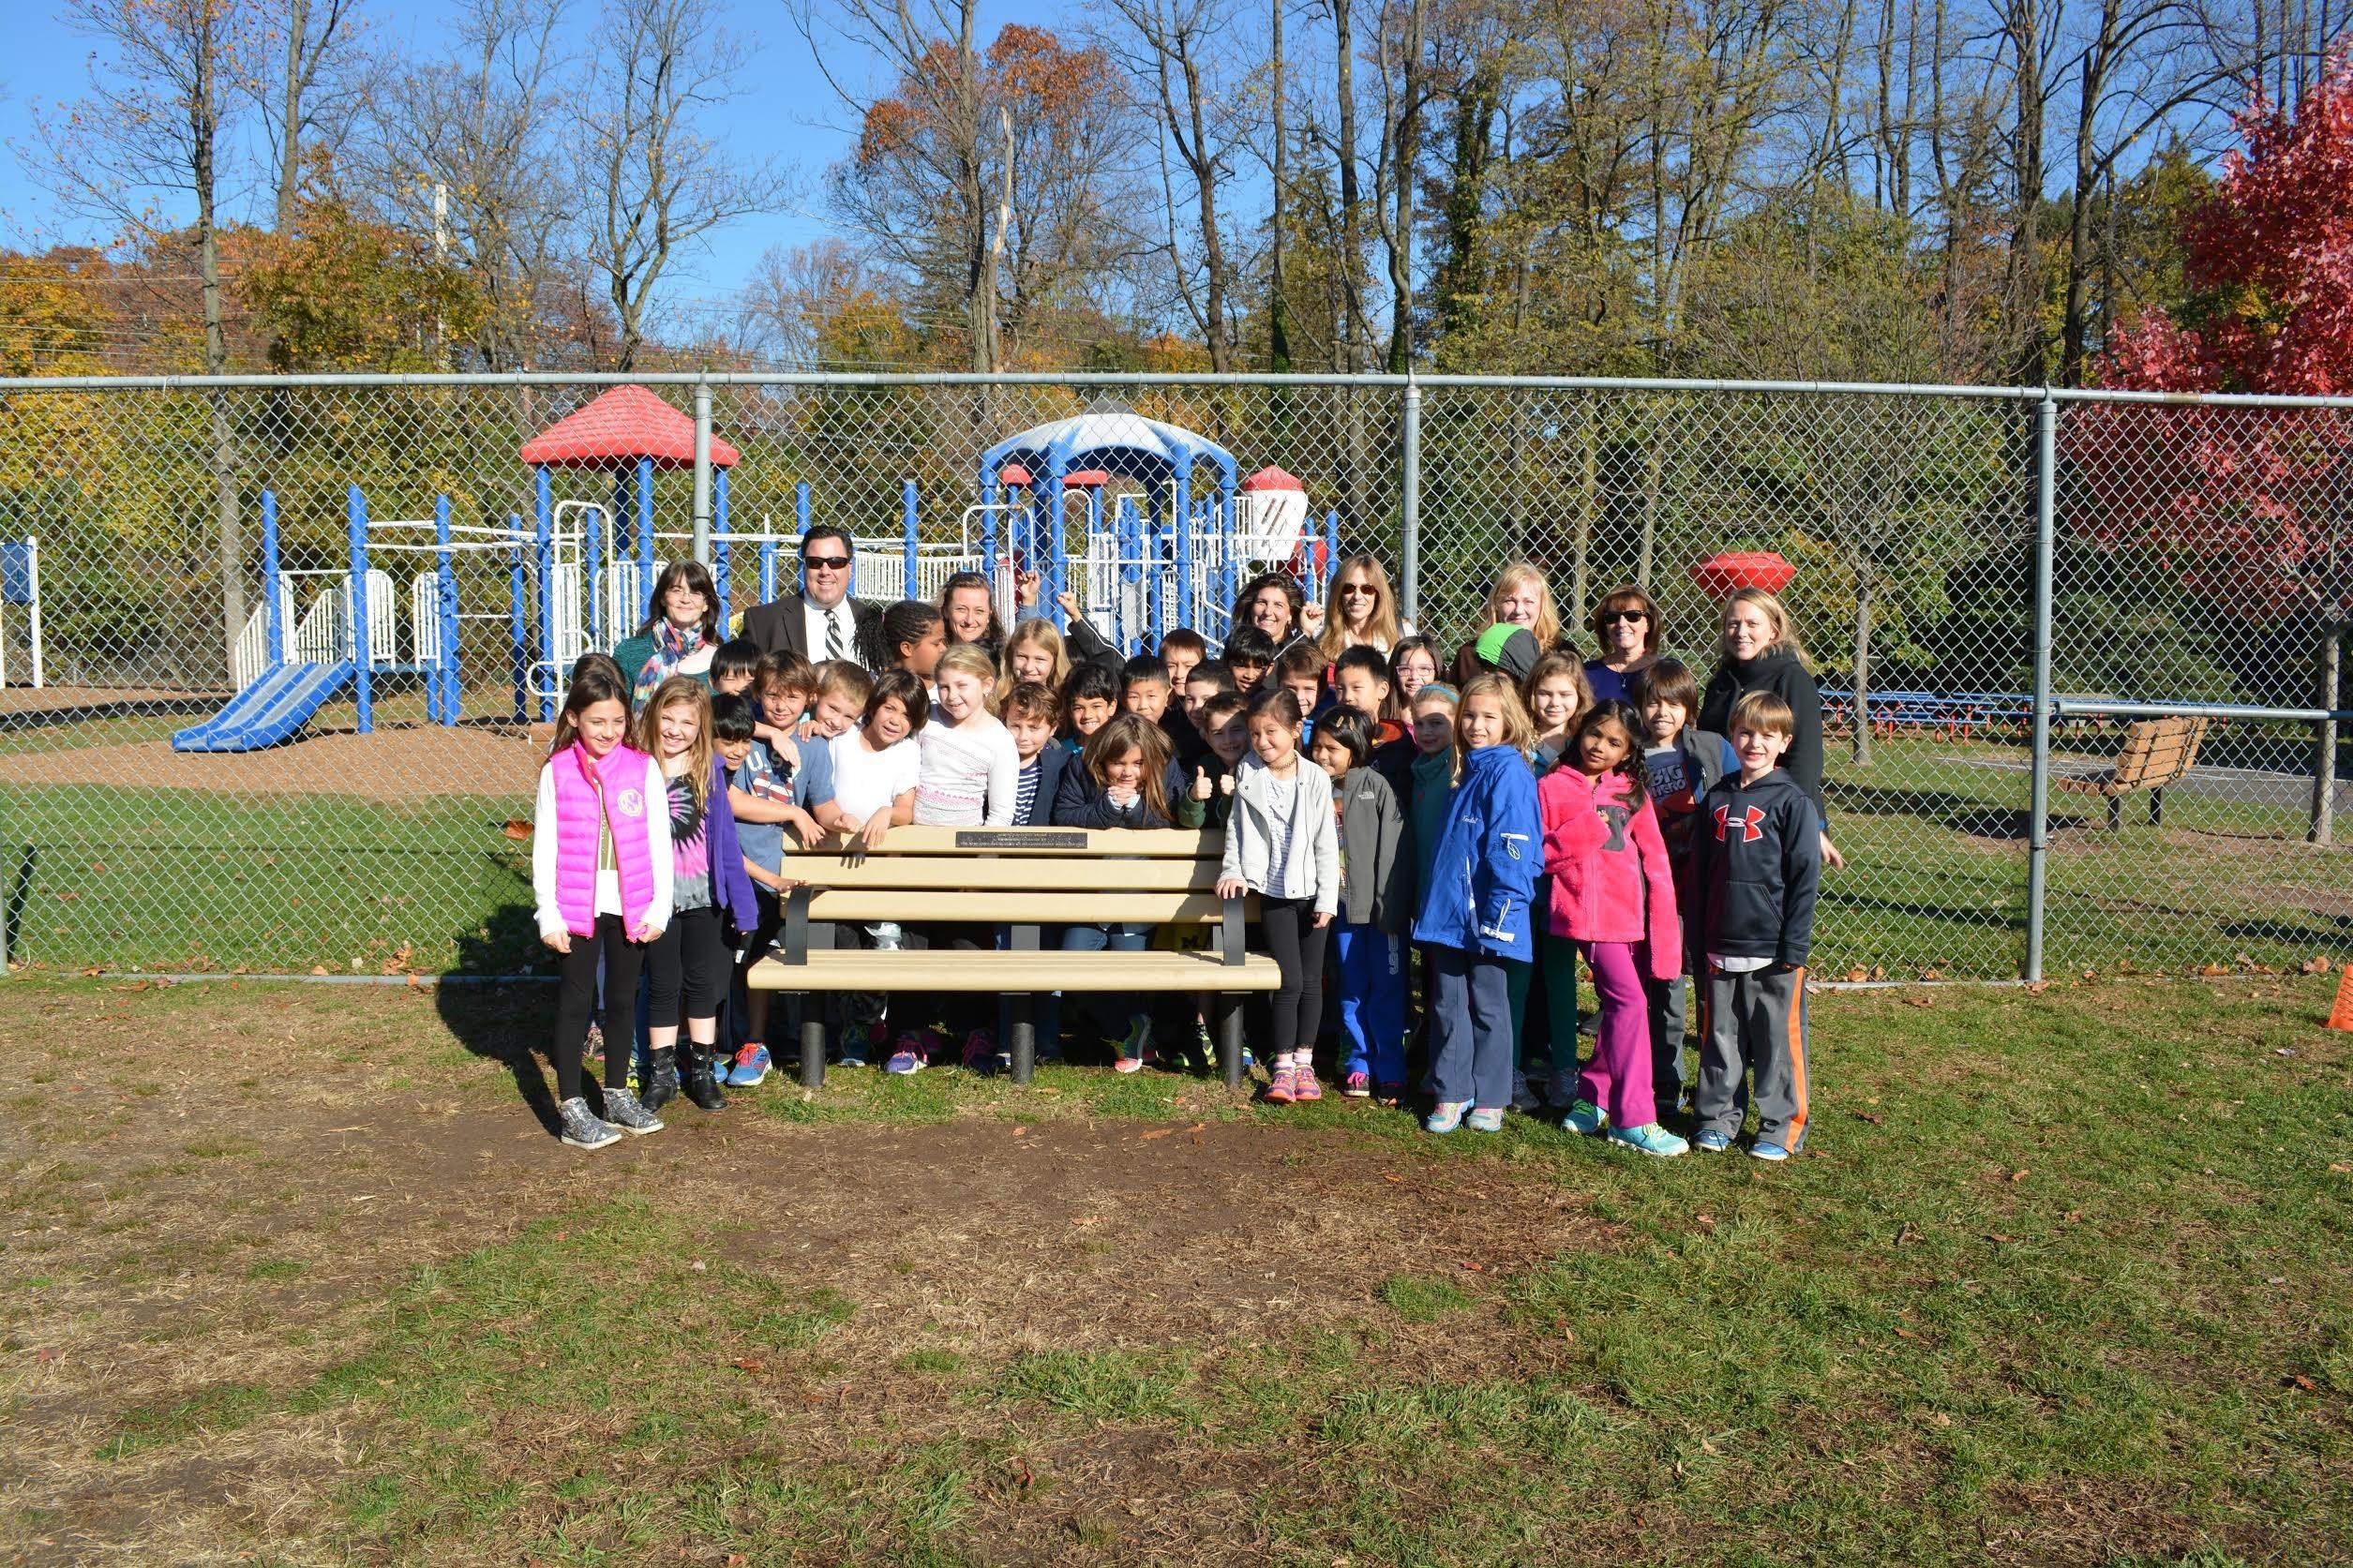 Glenwood Elementary Establishes Buddy Bench At Recess